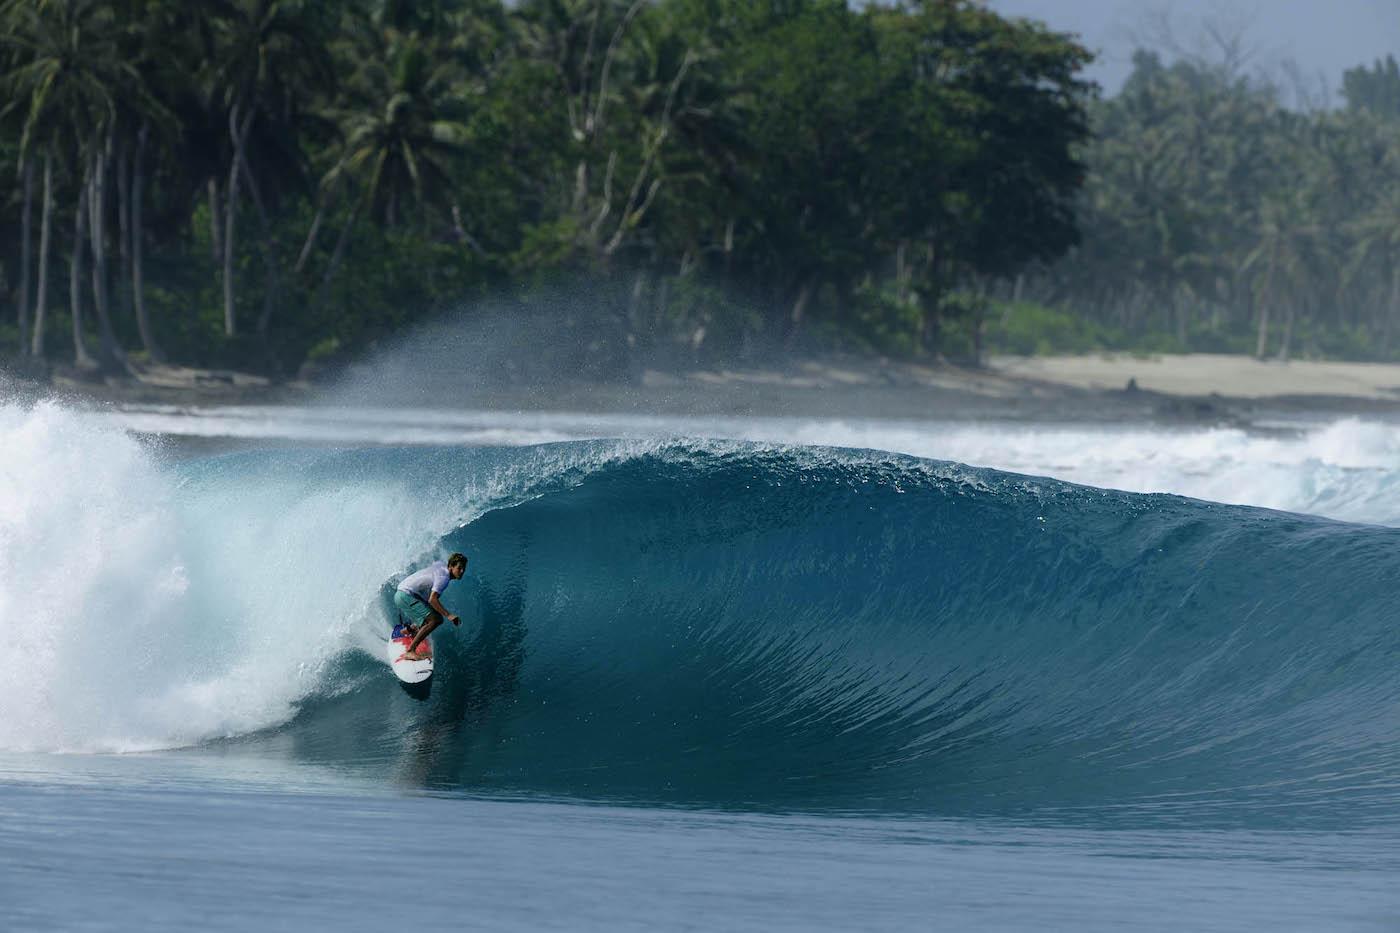 King Millenium Surf Charter Boat Mentawai Islands Surfing